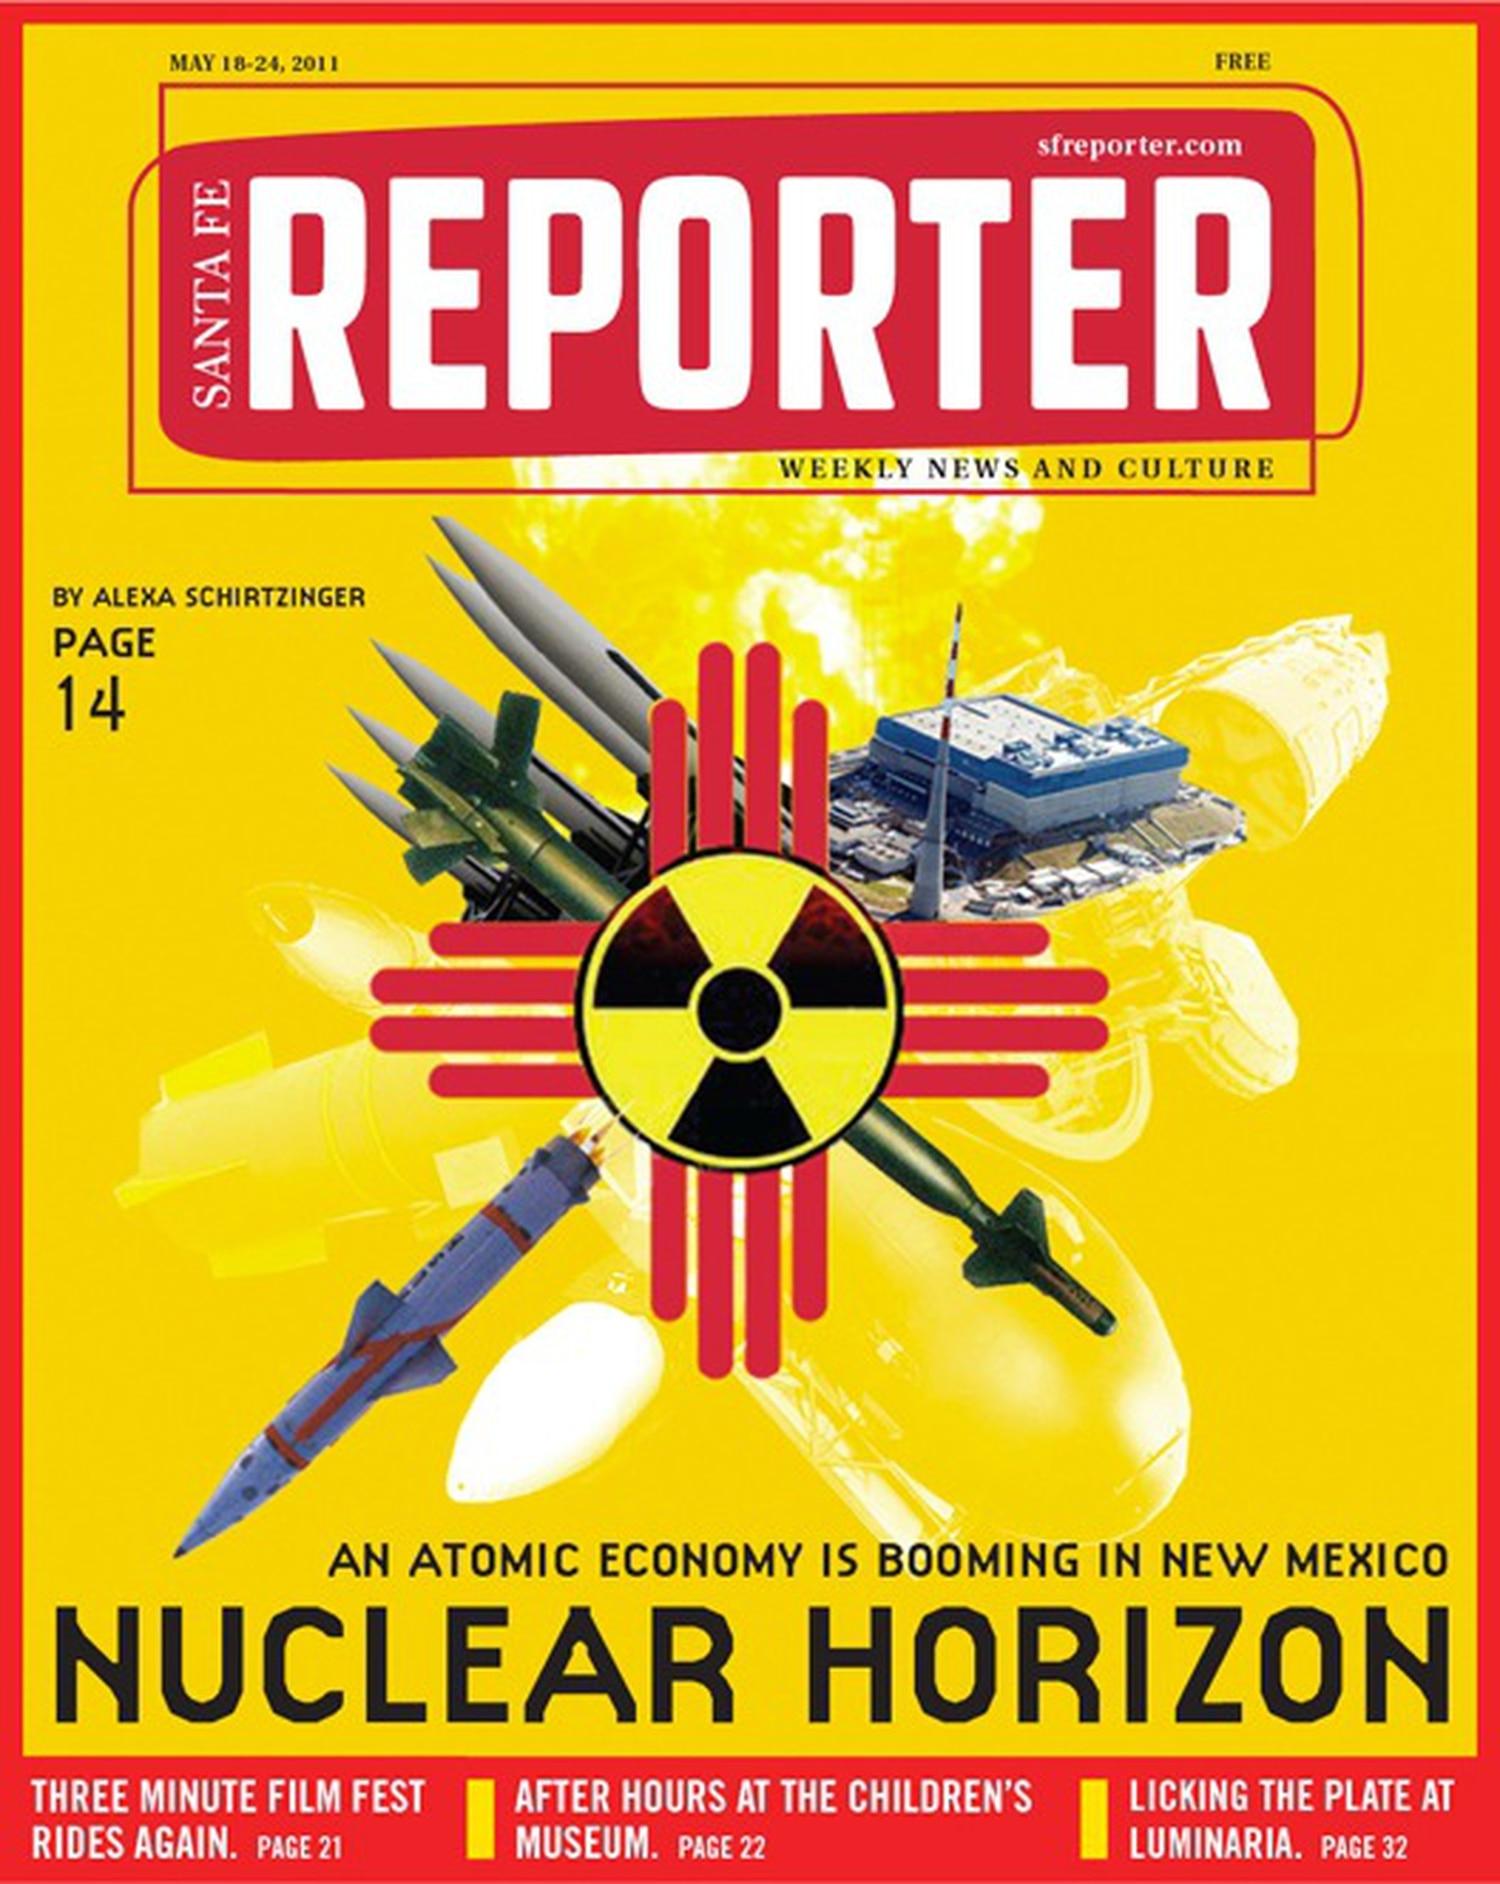 Nuclear Horizon | Cover Stories | Santa Fe Reporter